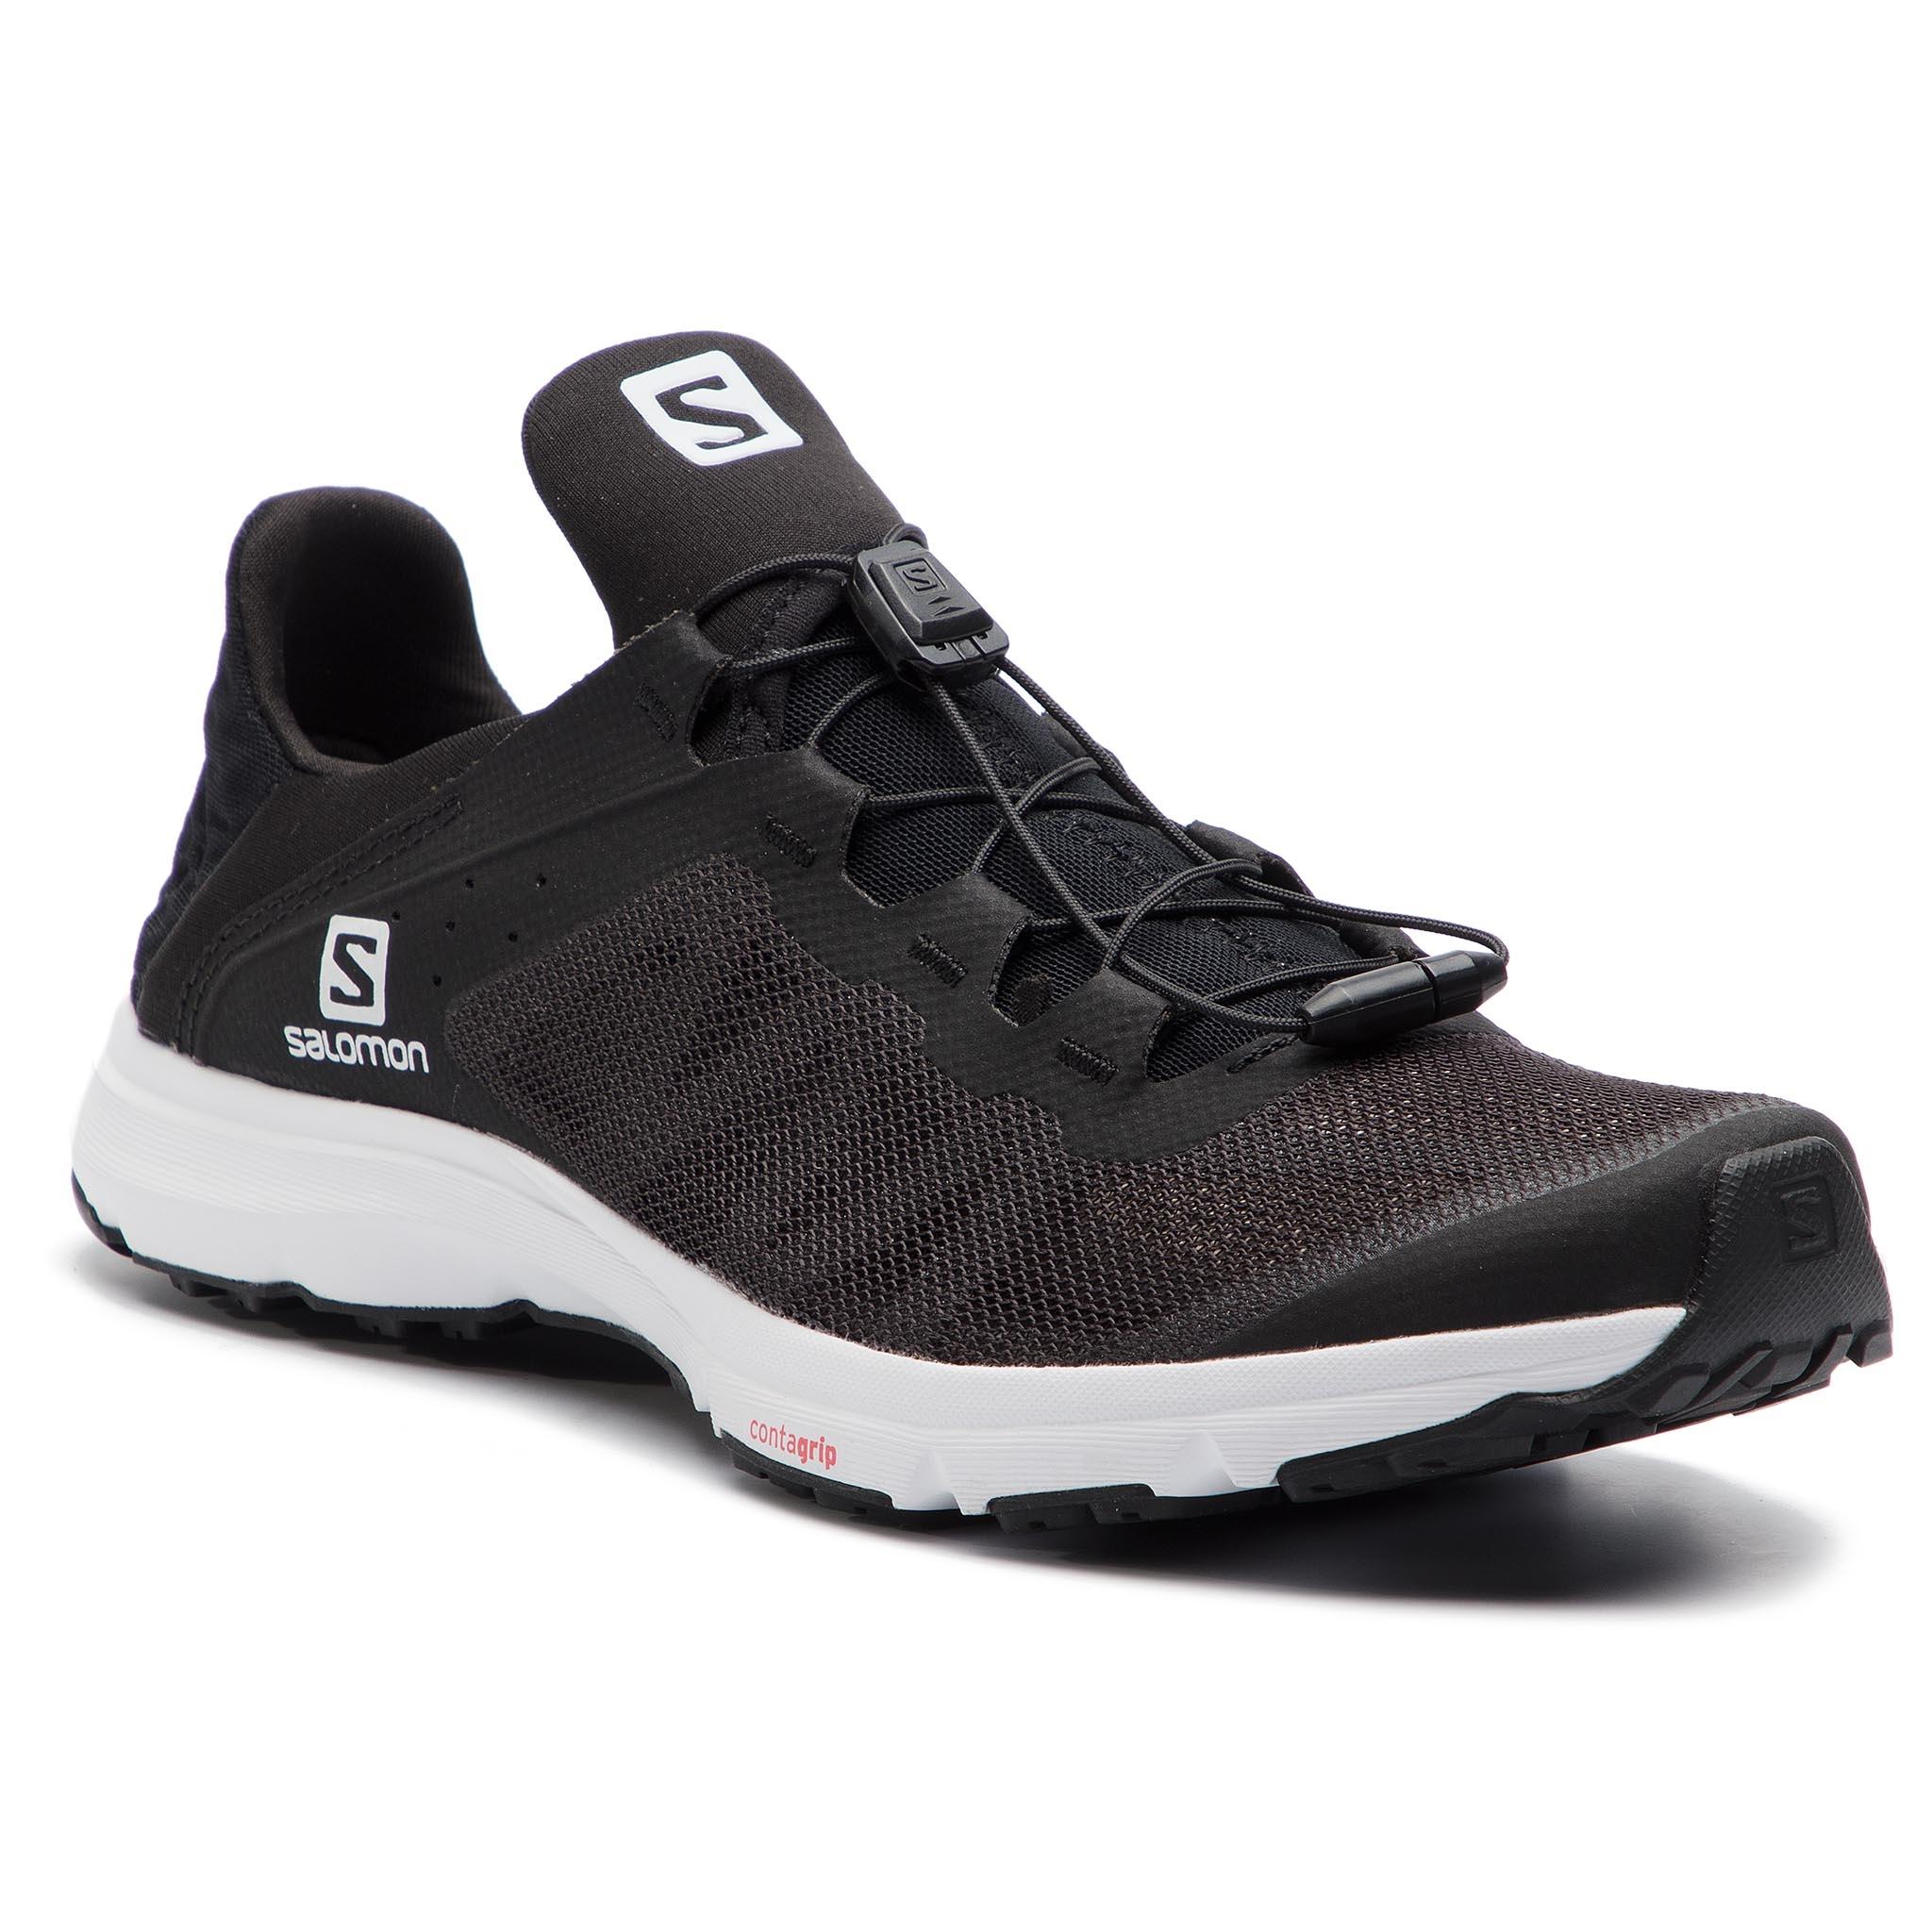 a5af72604d Shoes SALOMON - Amphib Bold W 407479 20 V0 Mineral Gray Crown Blue ...